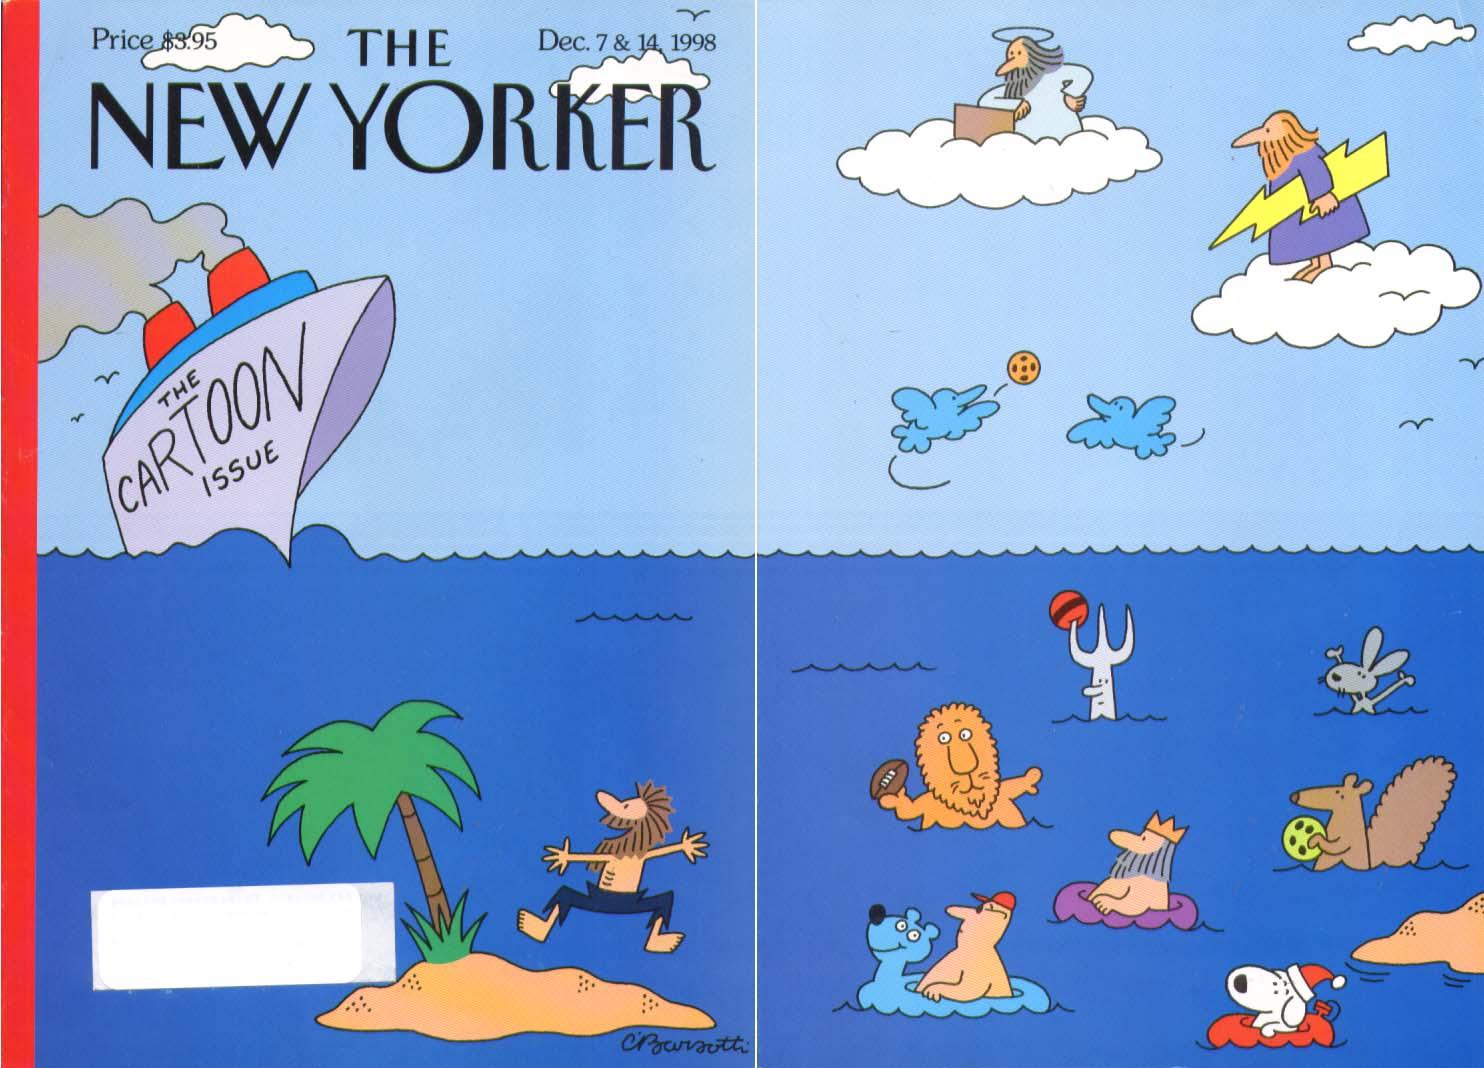 New Yorker cover Barsotti desert isle rescue 12/7 1998